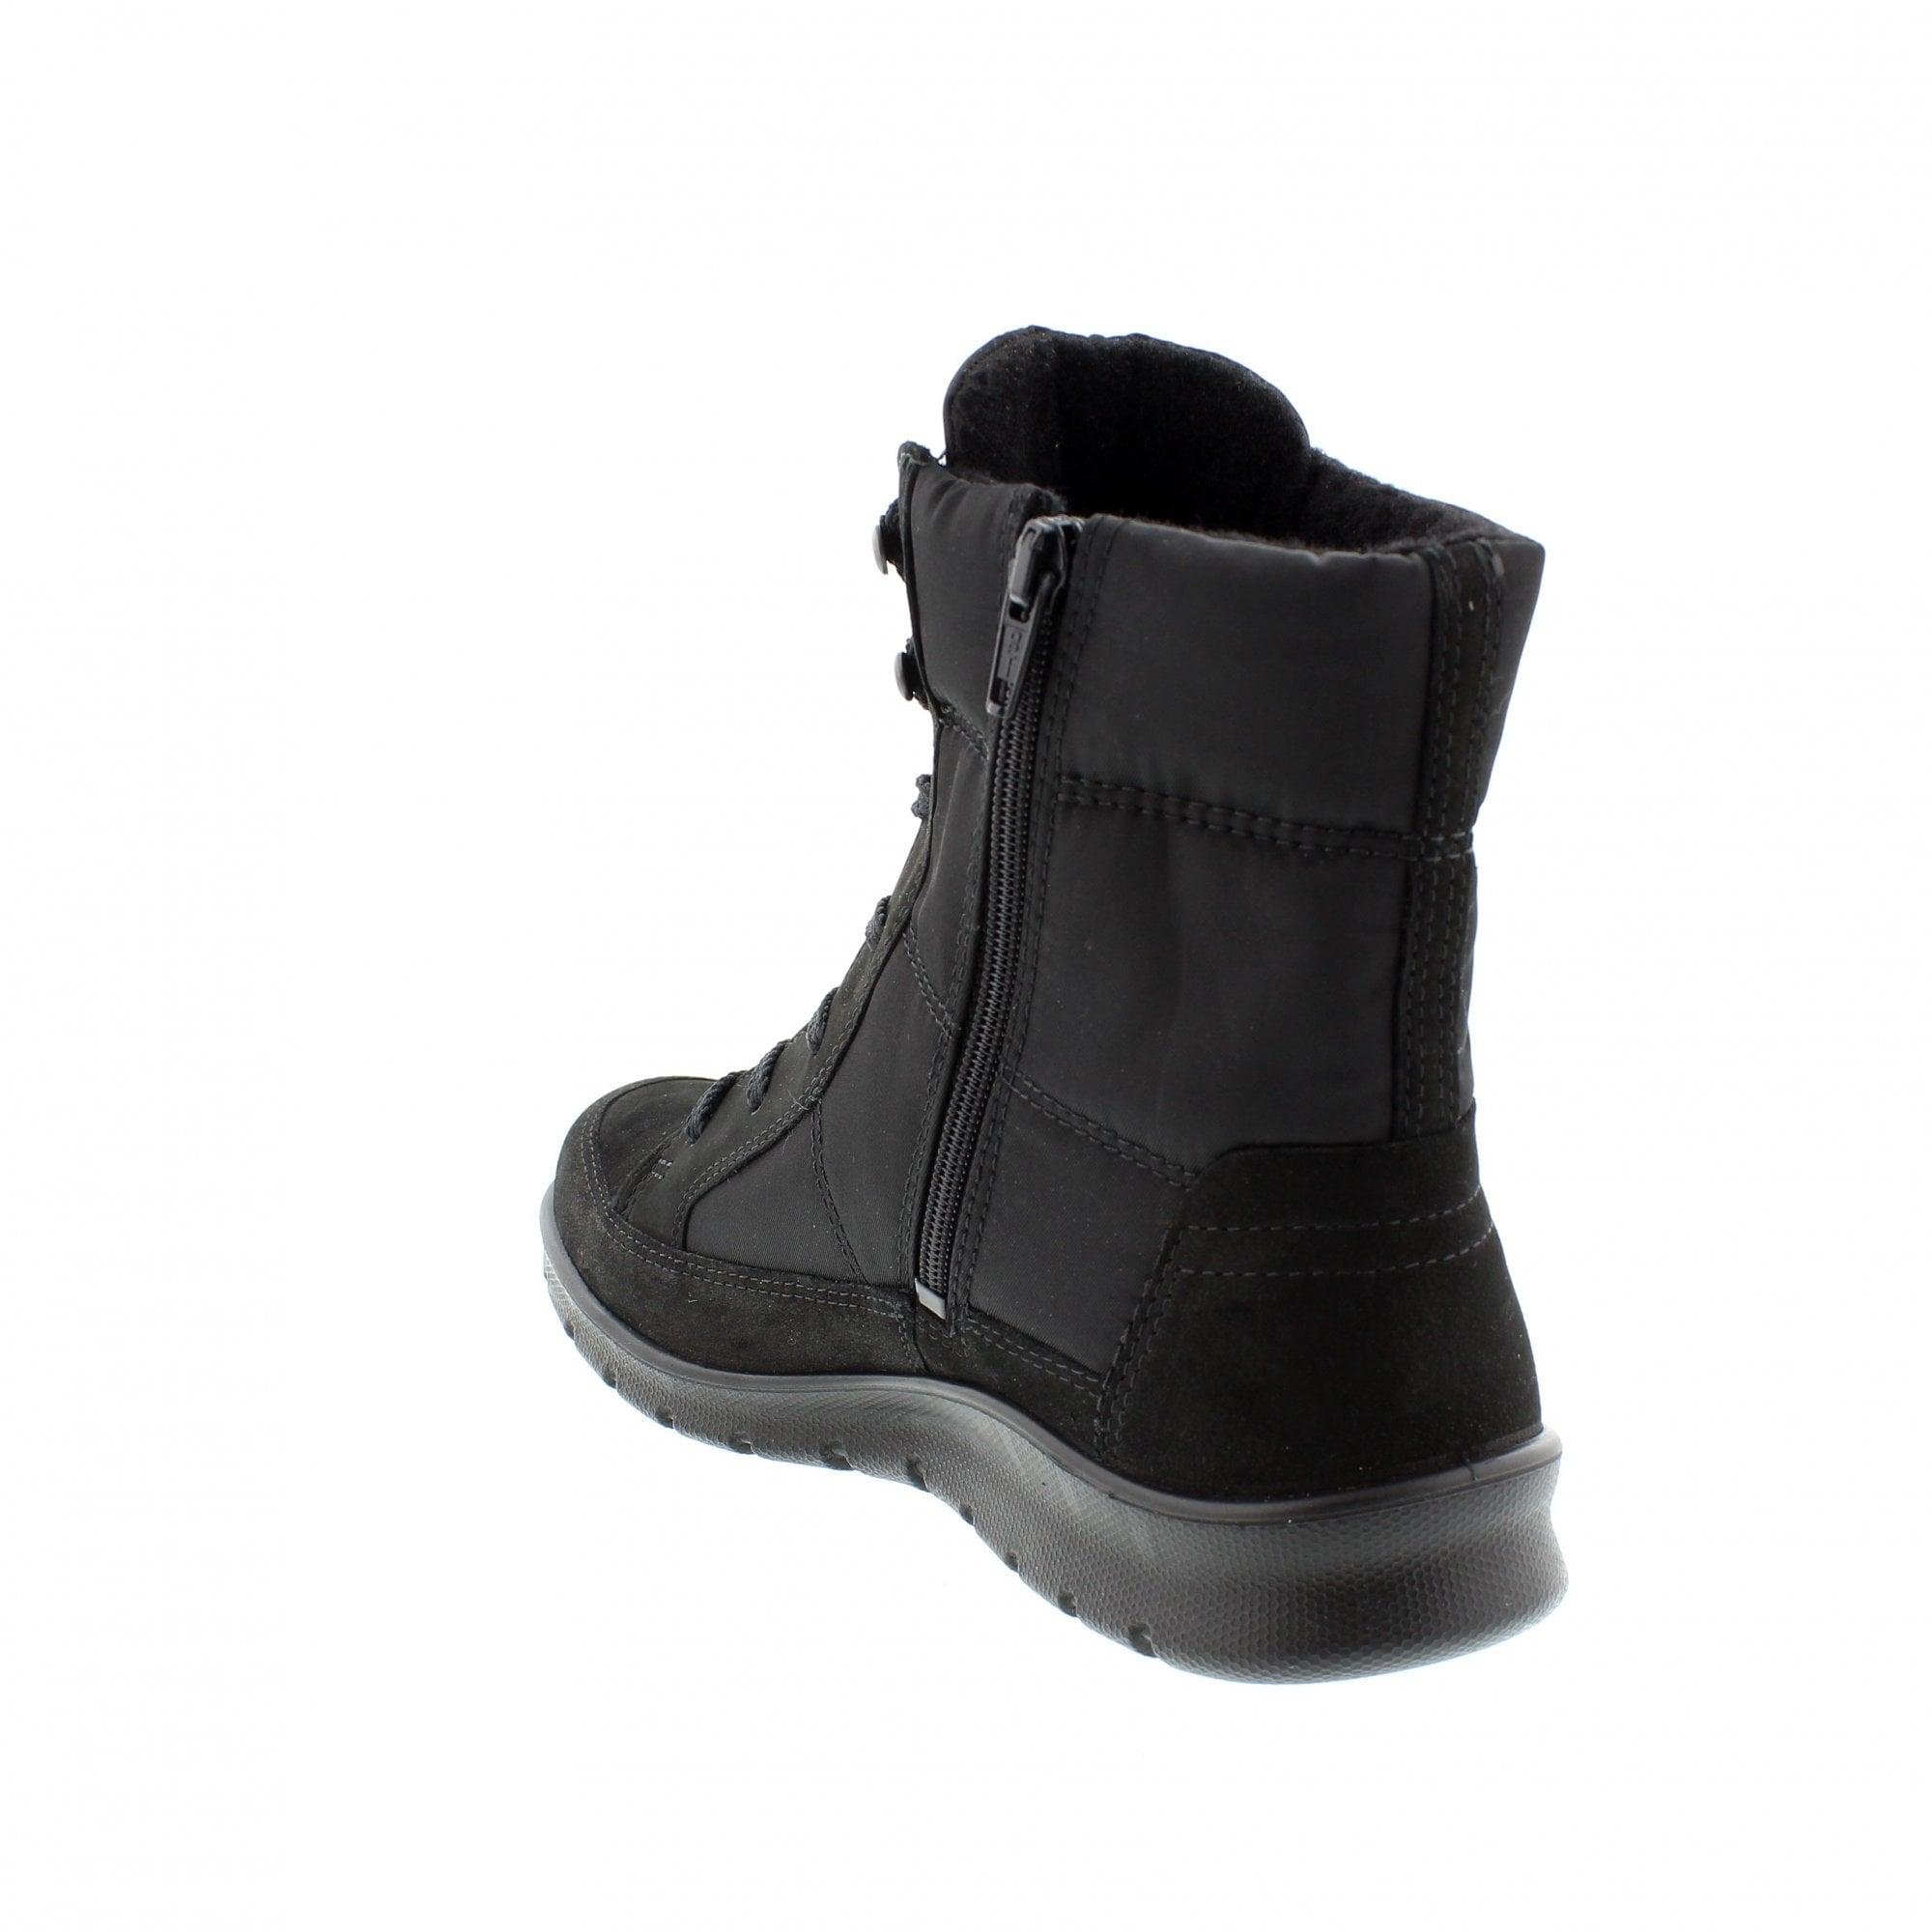 Ecco Babett 215553-02001 Womens Ankle